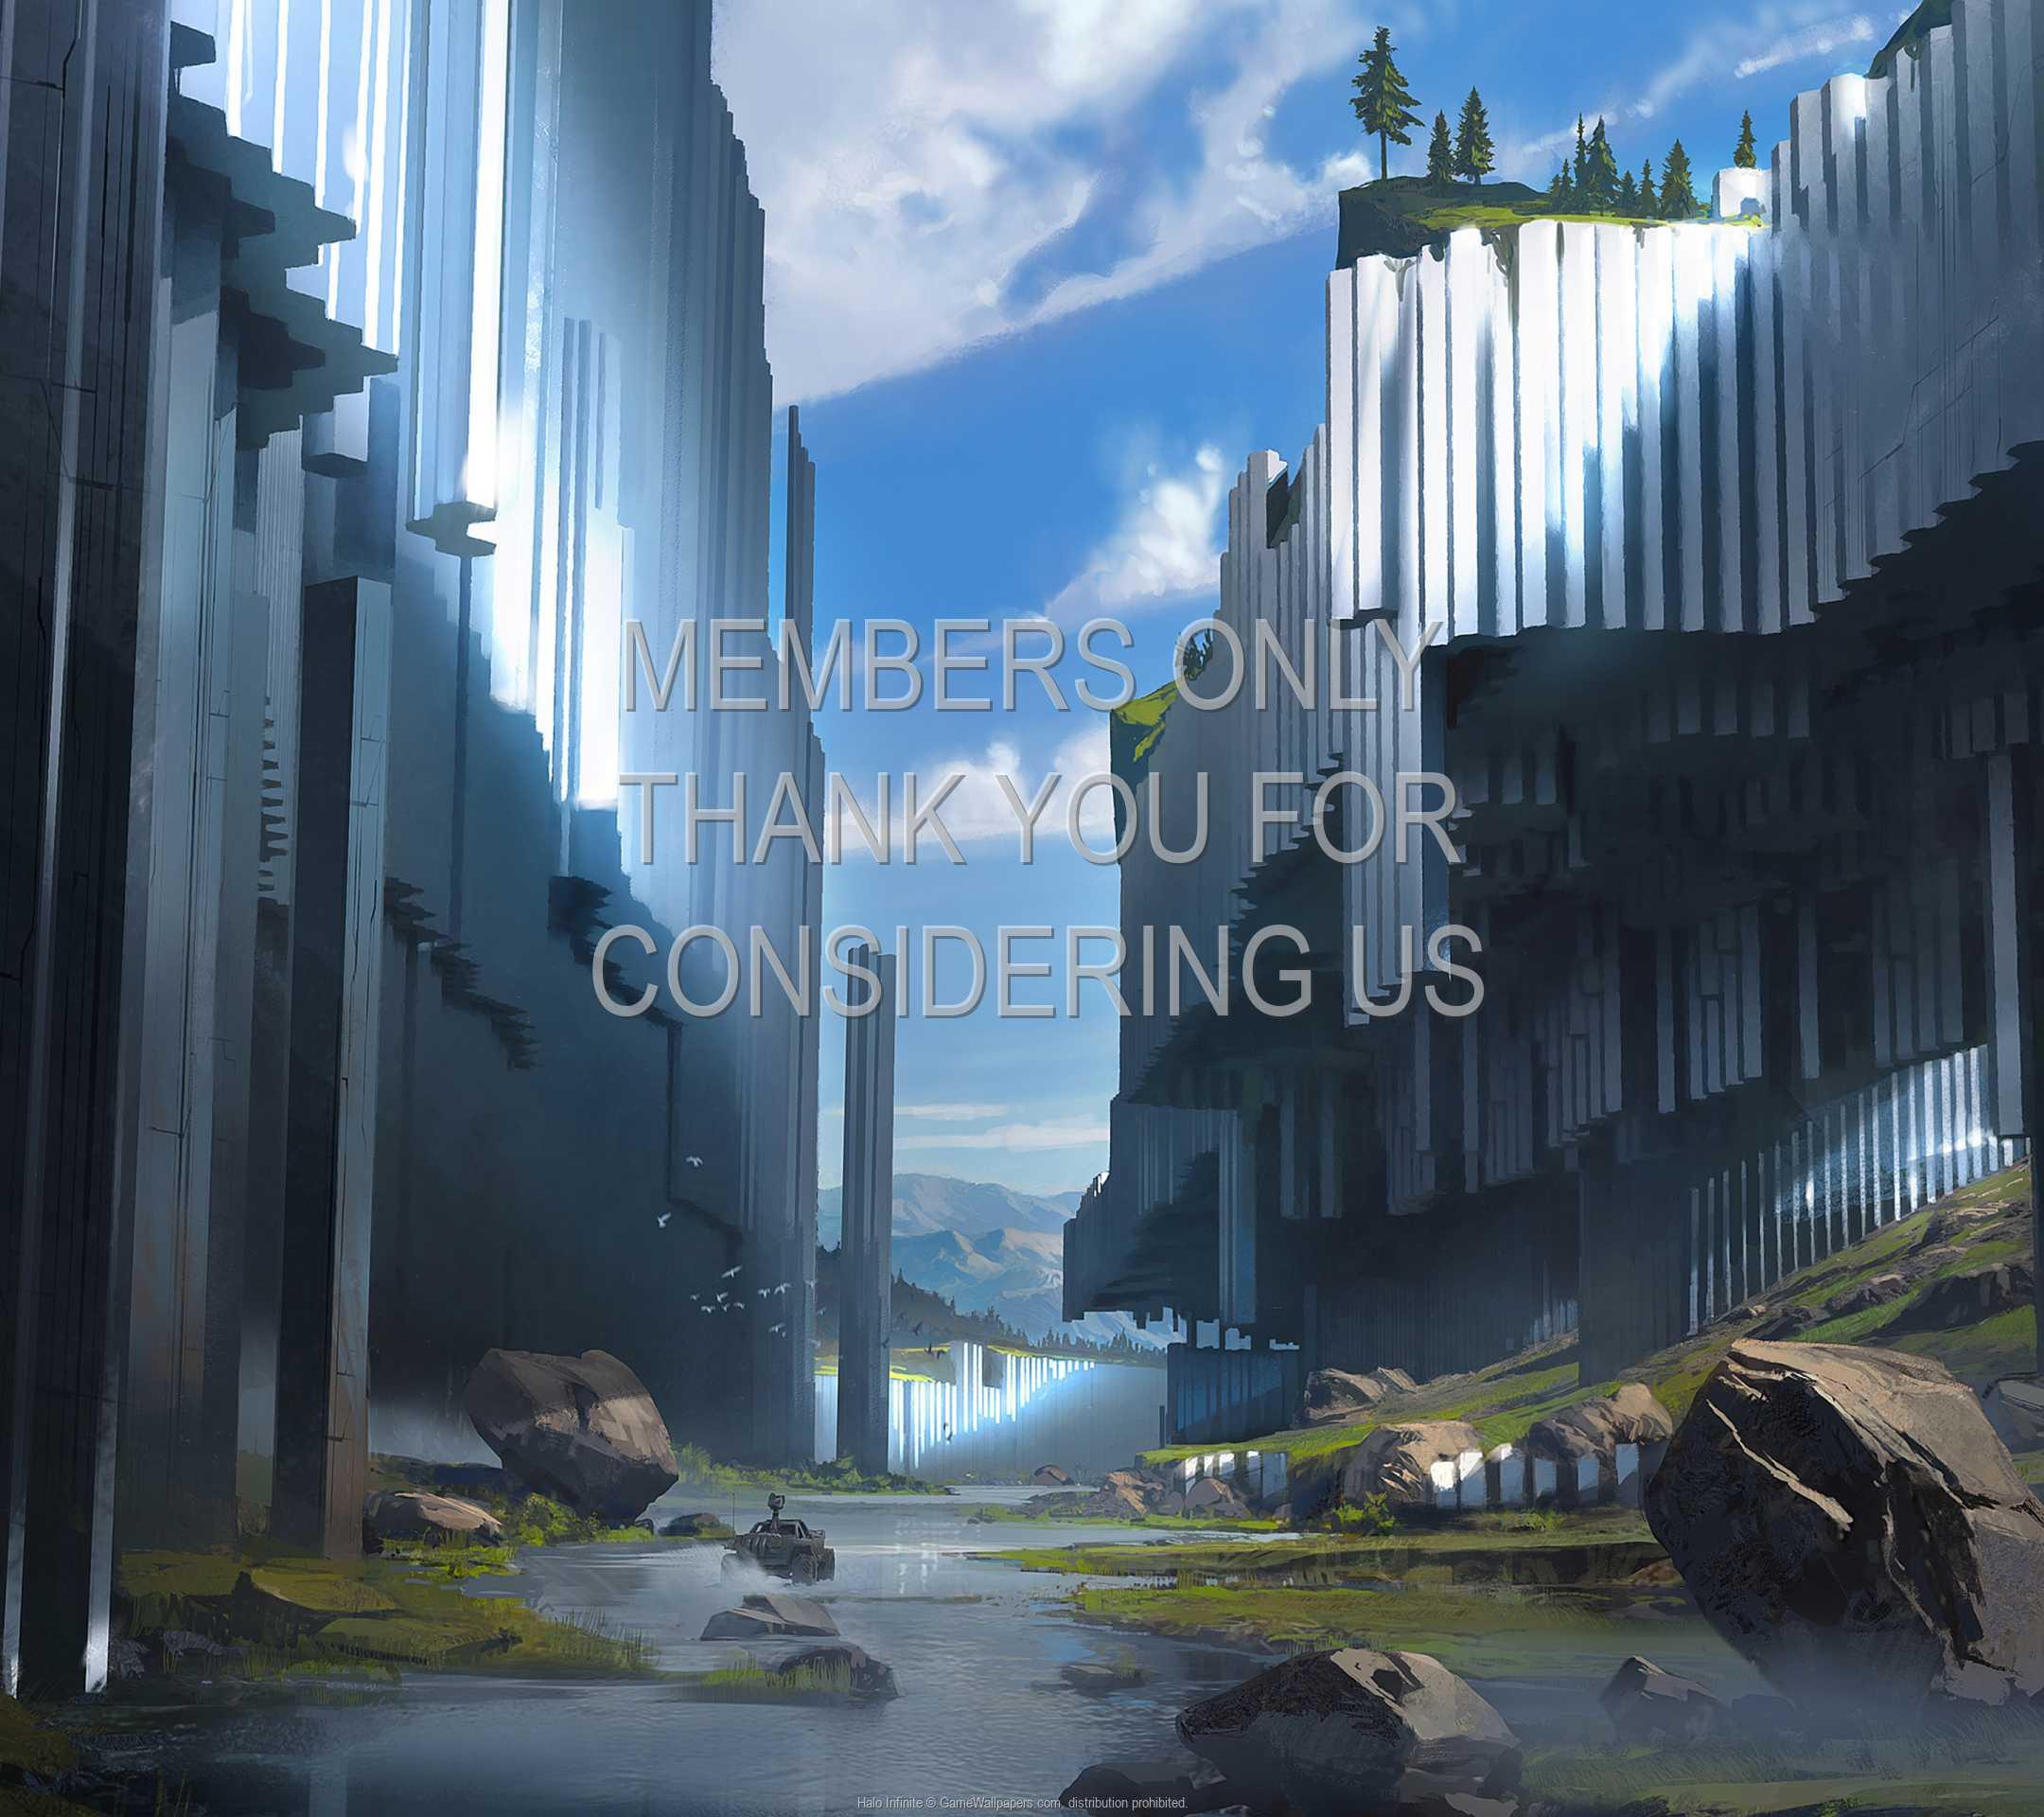 Halo: Infinite 1080p Horizontal Móvil fondo de escritorio 13